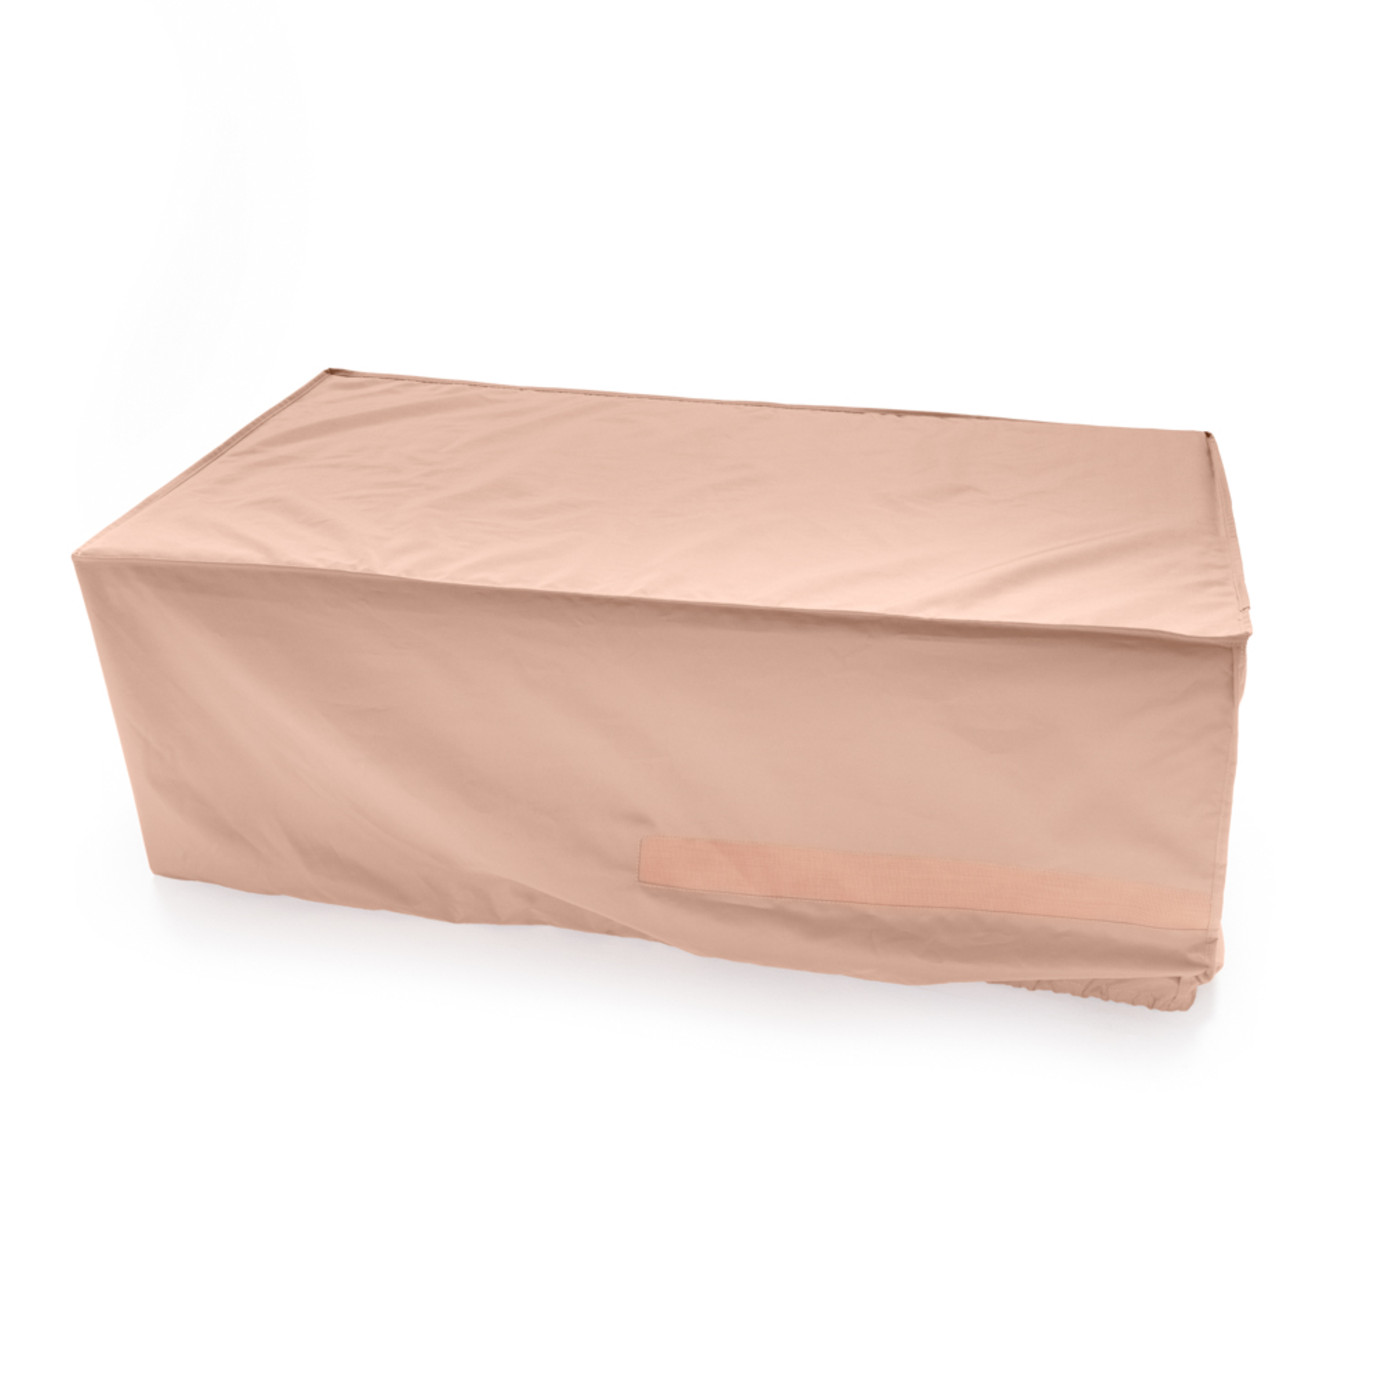 Milo Coffee Table Furniture Cover